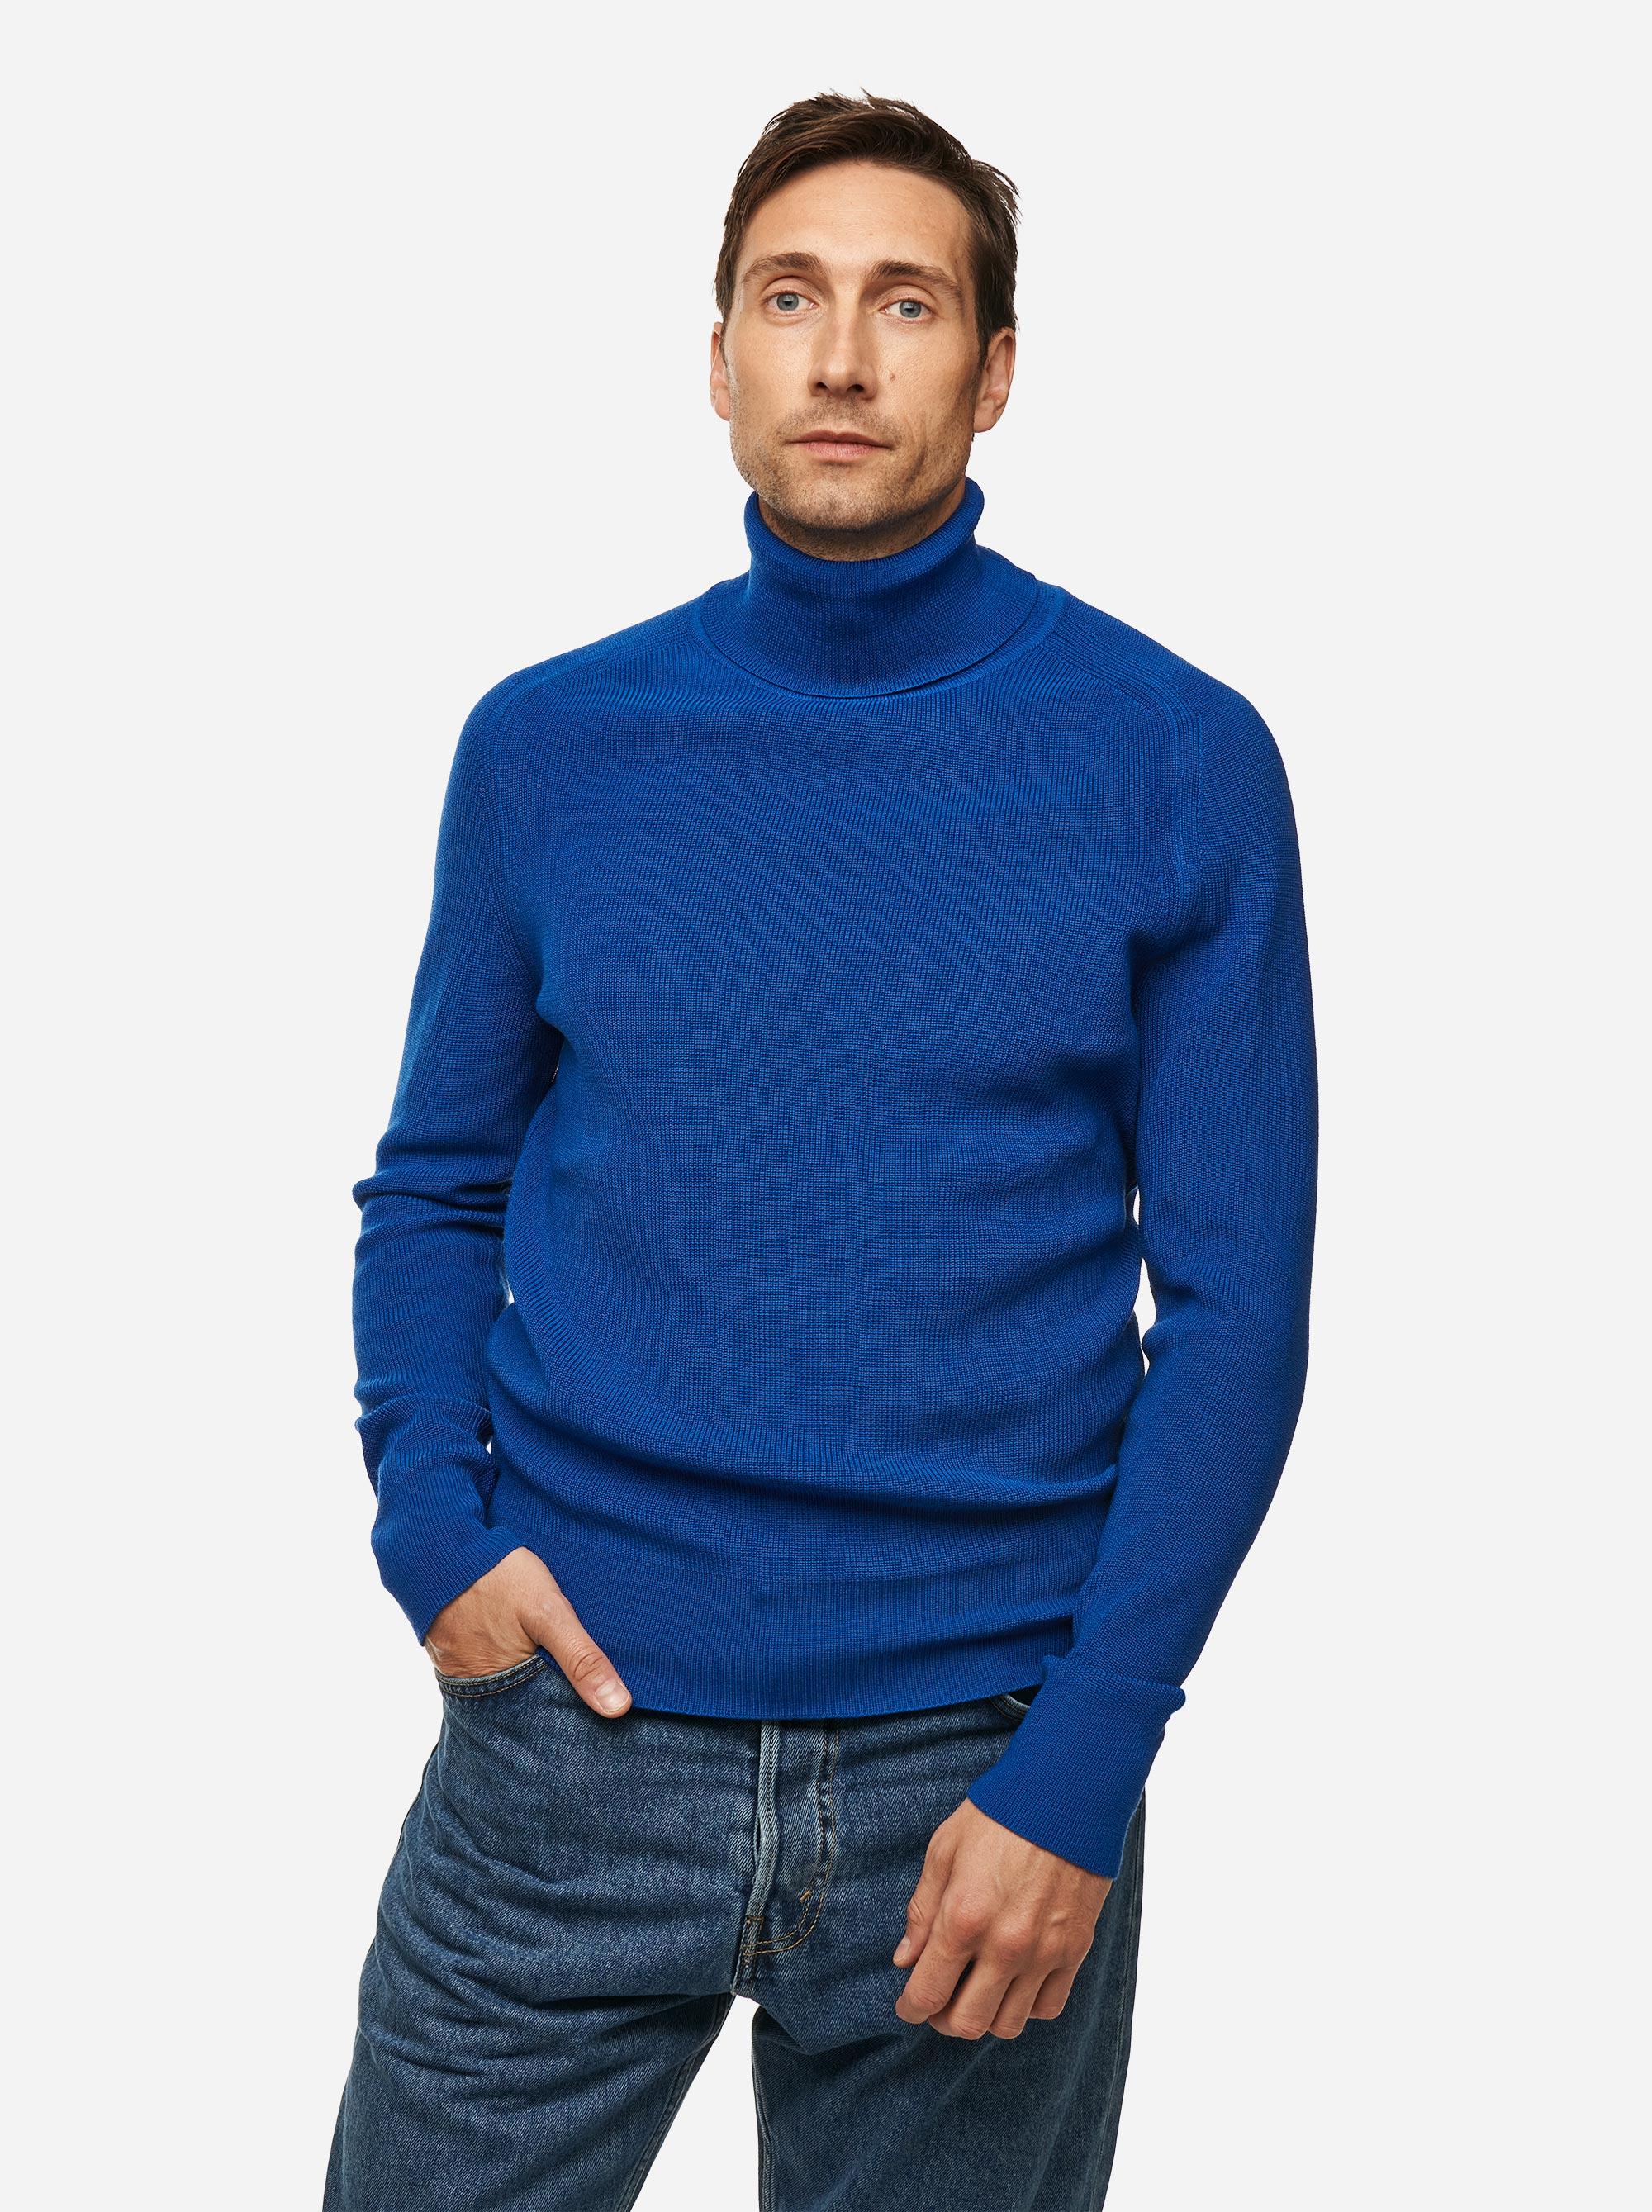 Teym - Turtleneck - The Merino Sweater - Men - Cobalt blue - 1